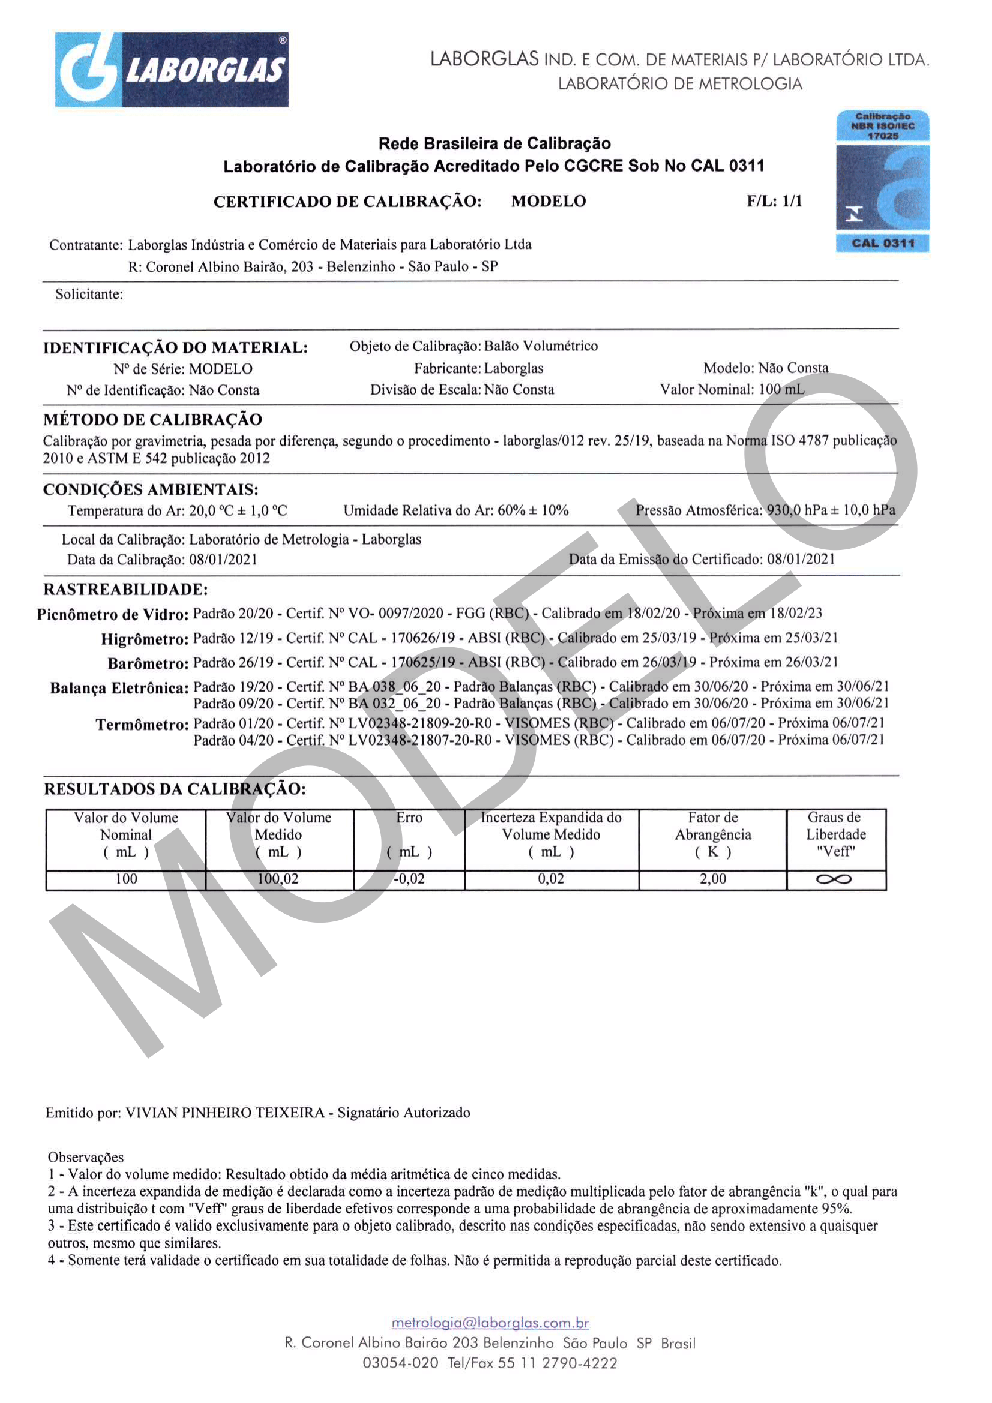 BALÃO VOLUMÉTRICO CLASSE A ROLHA POLI C/ CERTIFICADO RBC 20 ML - Marca Laborglas - Cód. 9167812-R